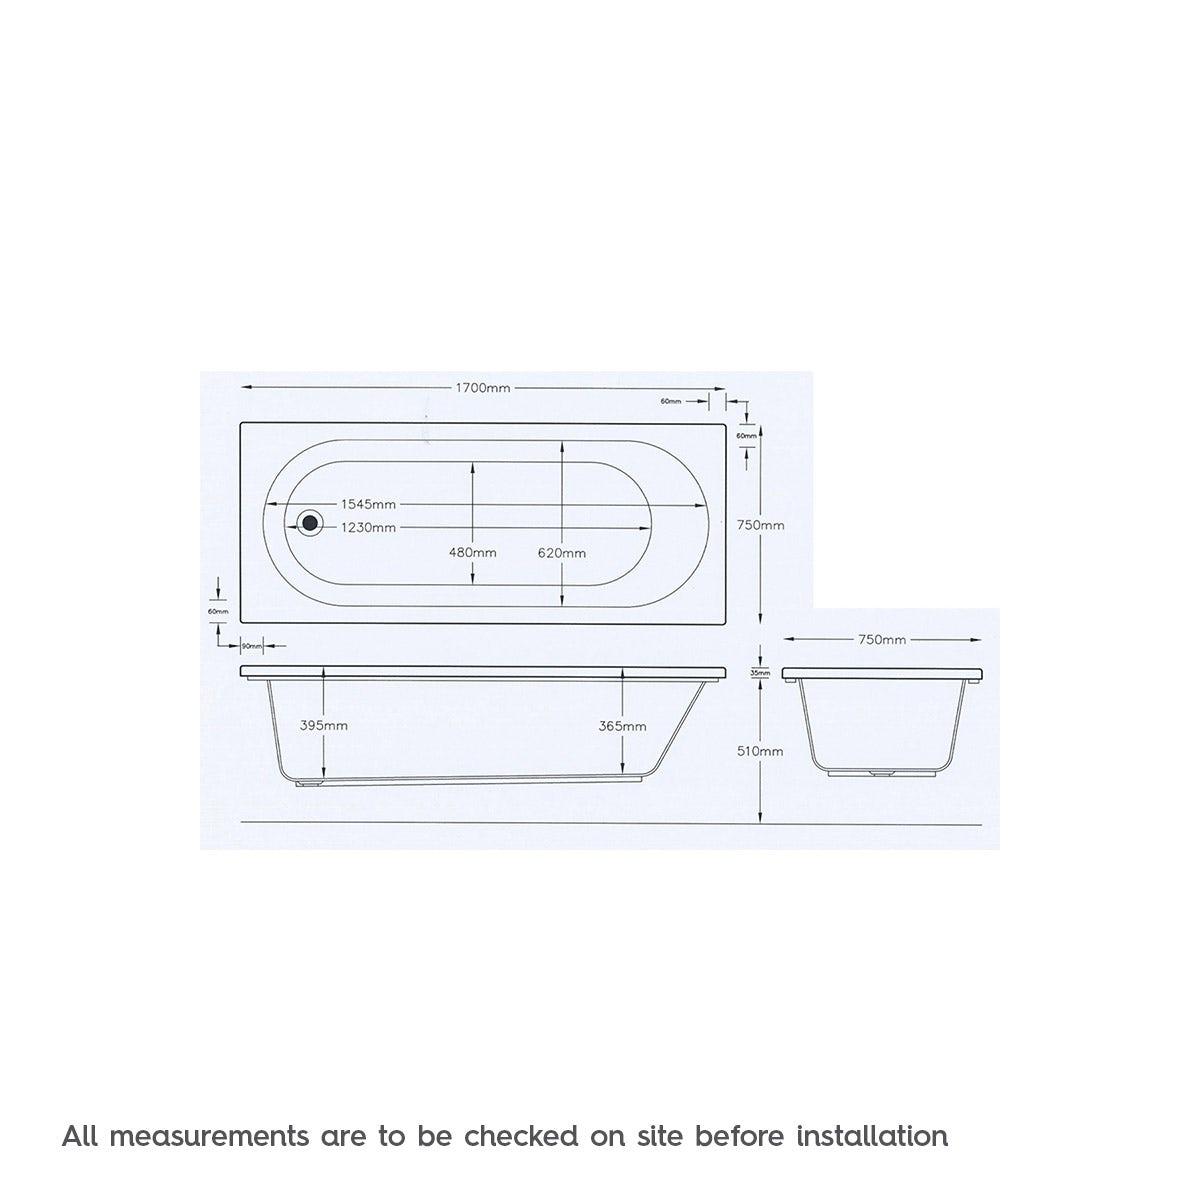 Dimensions for Mode Richmond single end 12 jet whirlpool bath 1700 x 750